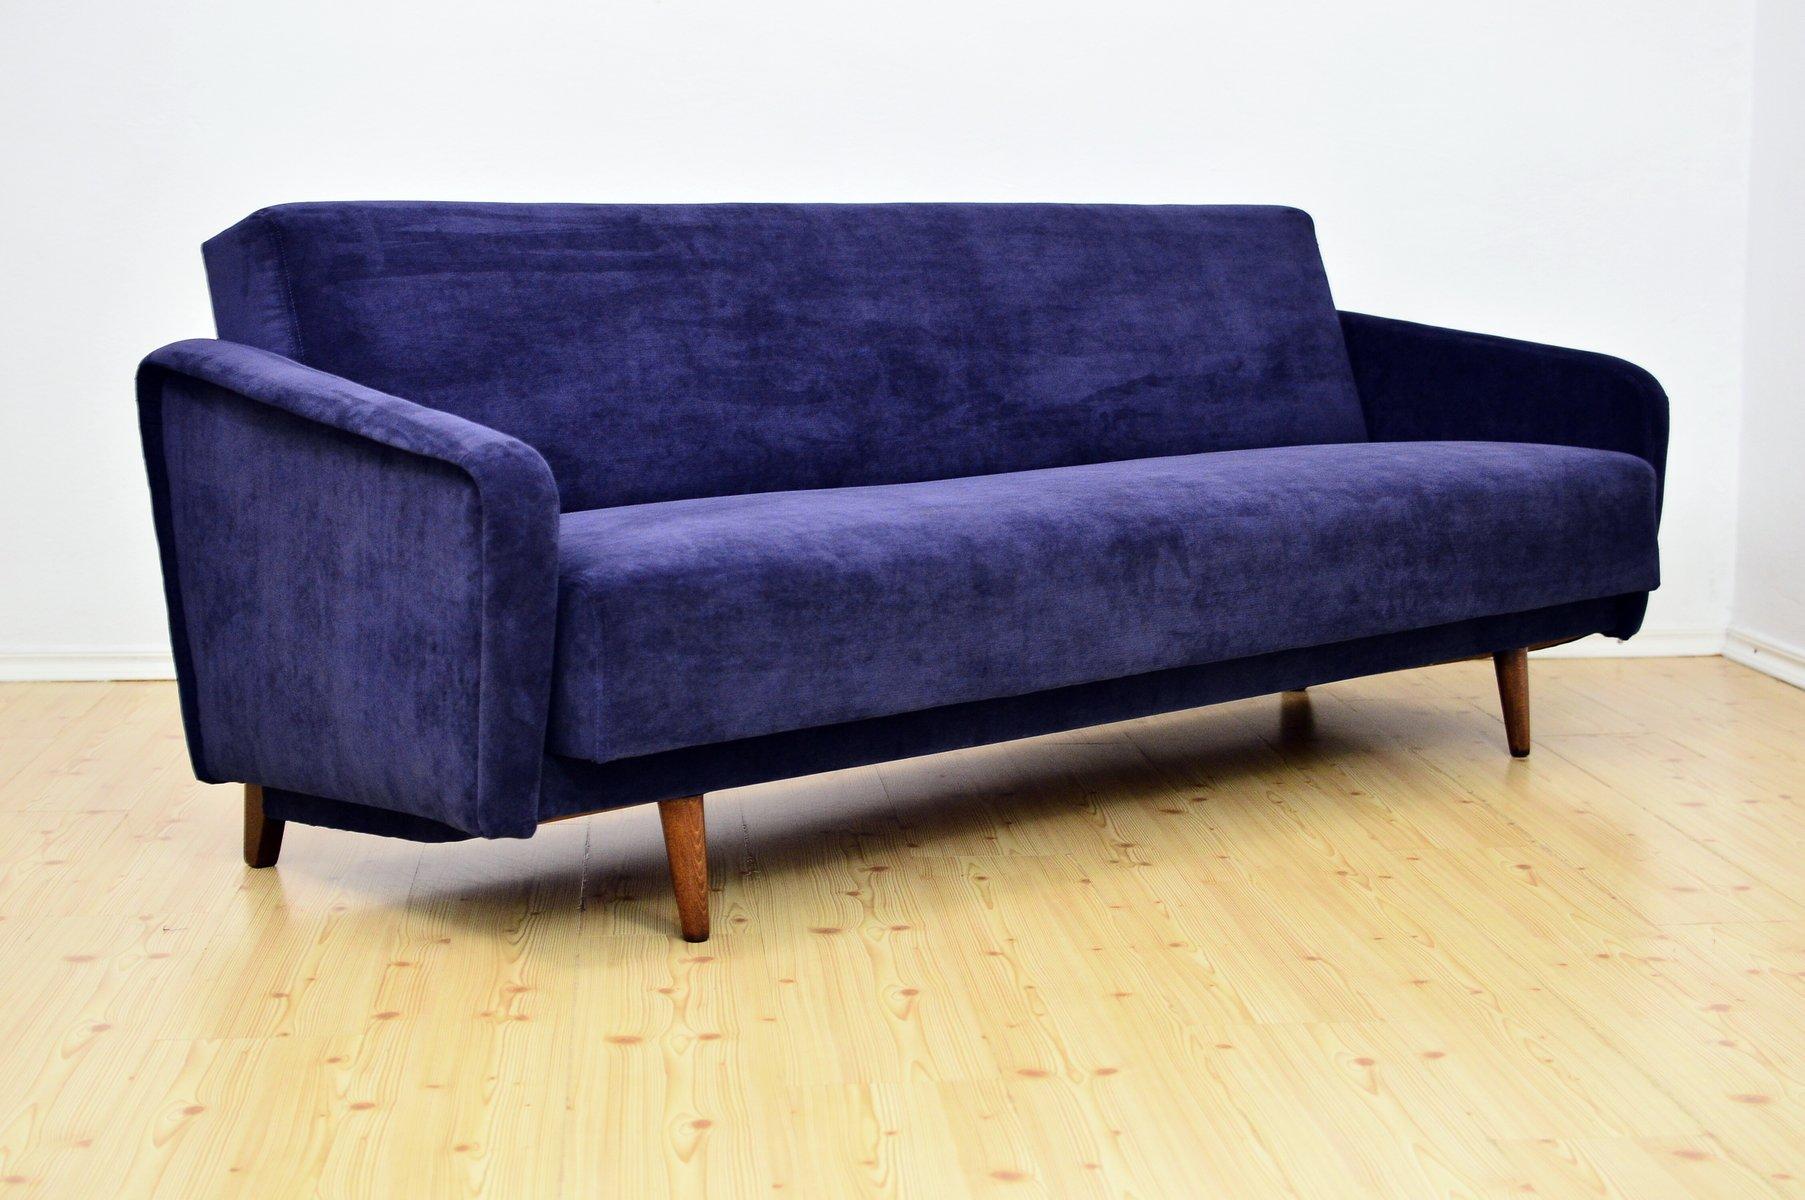 navy blue sofa bed uk sack bean bags bag chair 3 cinnabar beds cindy crawford home bellingham indigo